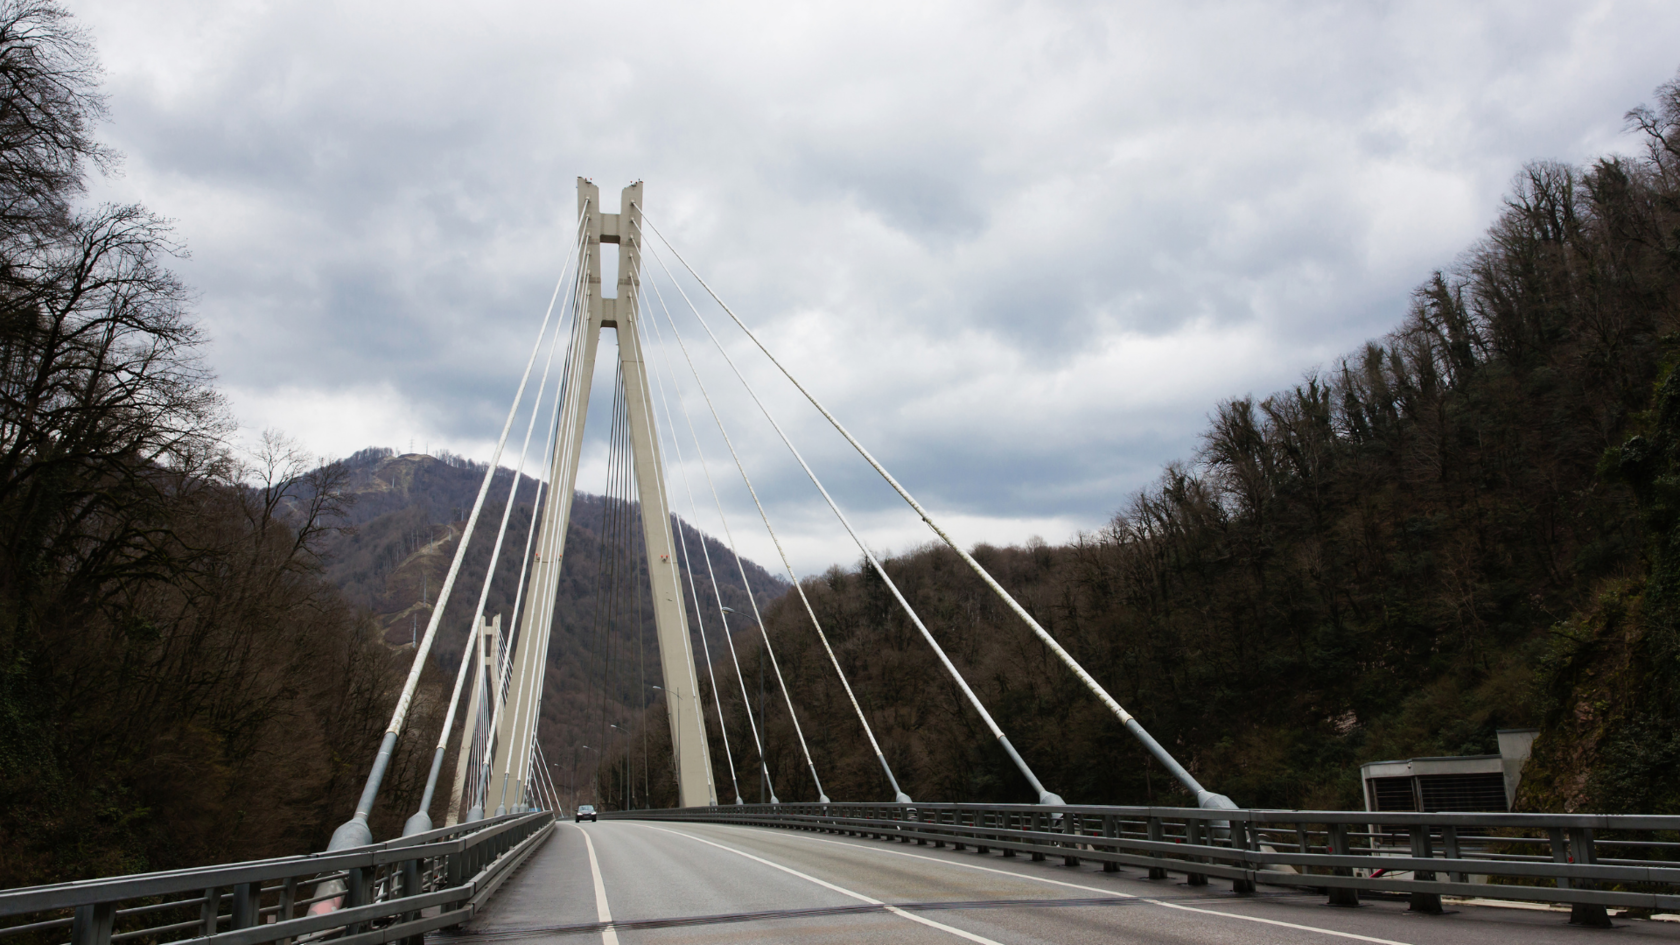 вантовый мост на красную поляну